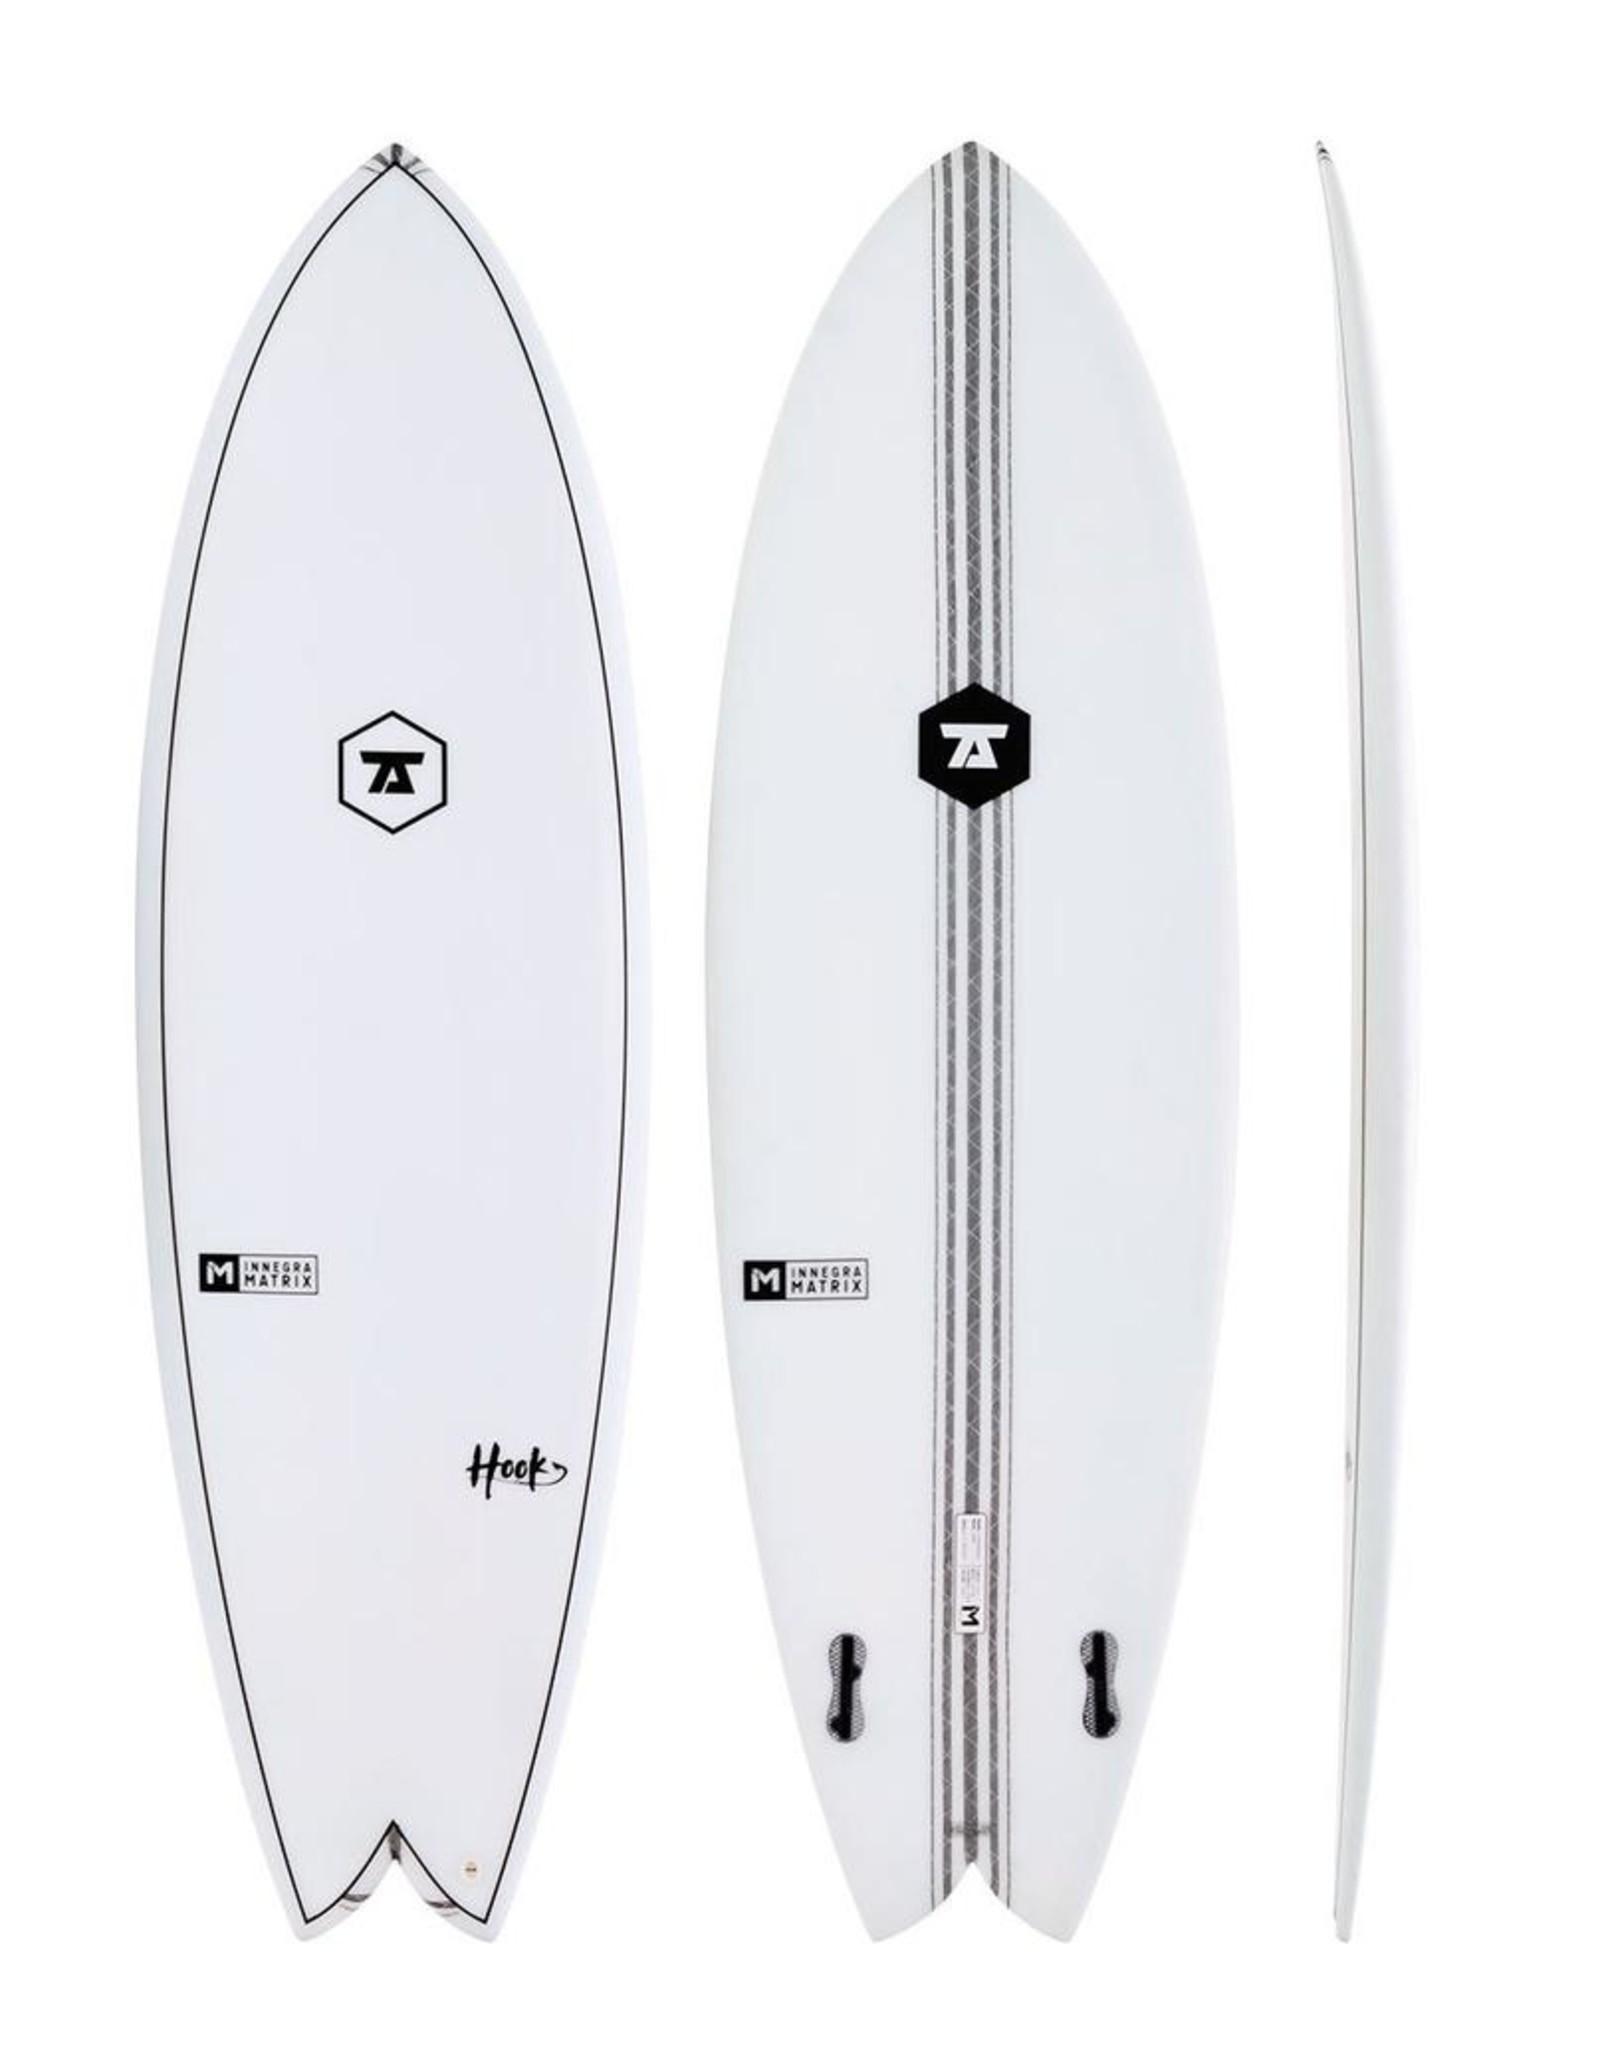 7S 7S - 5'10 Hook IM Twin Fin − 33L - FCS2